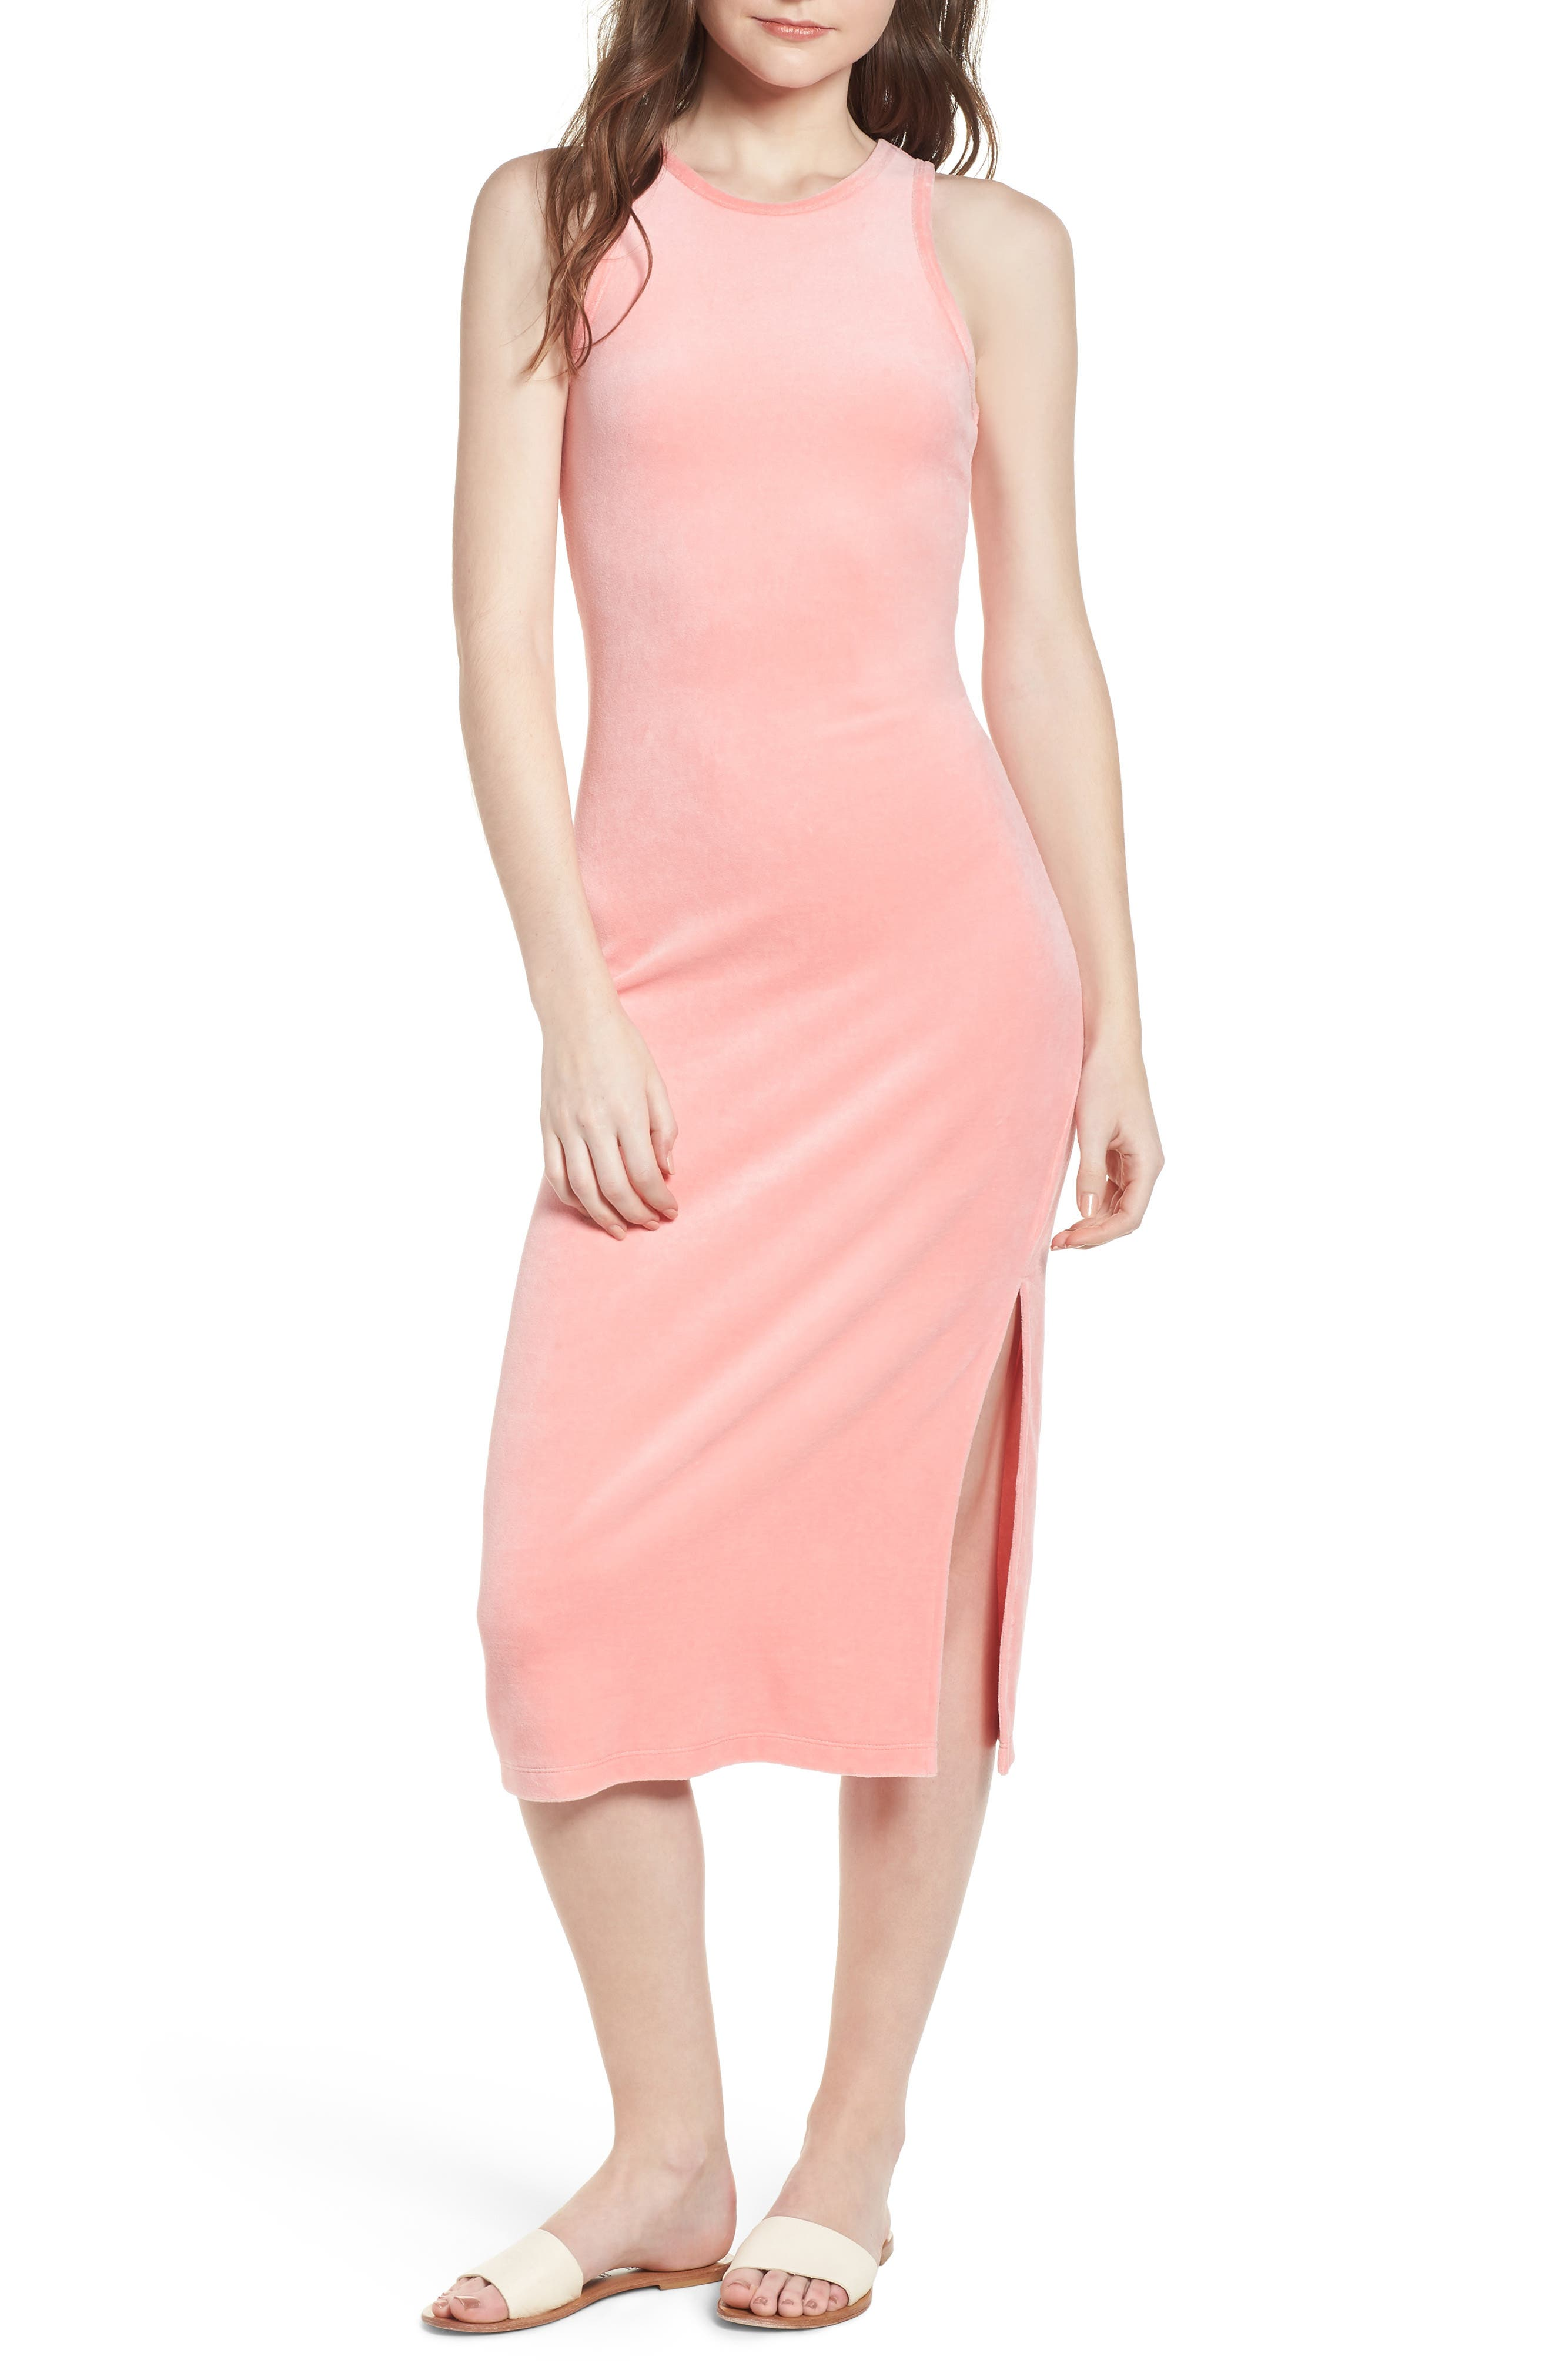 Stretch Velour Tank Midi Dress,                         Main,                         color, Sorbet Pink